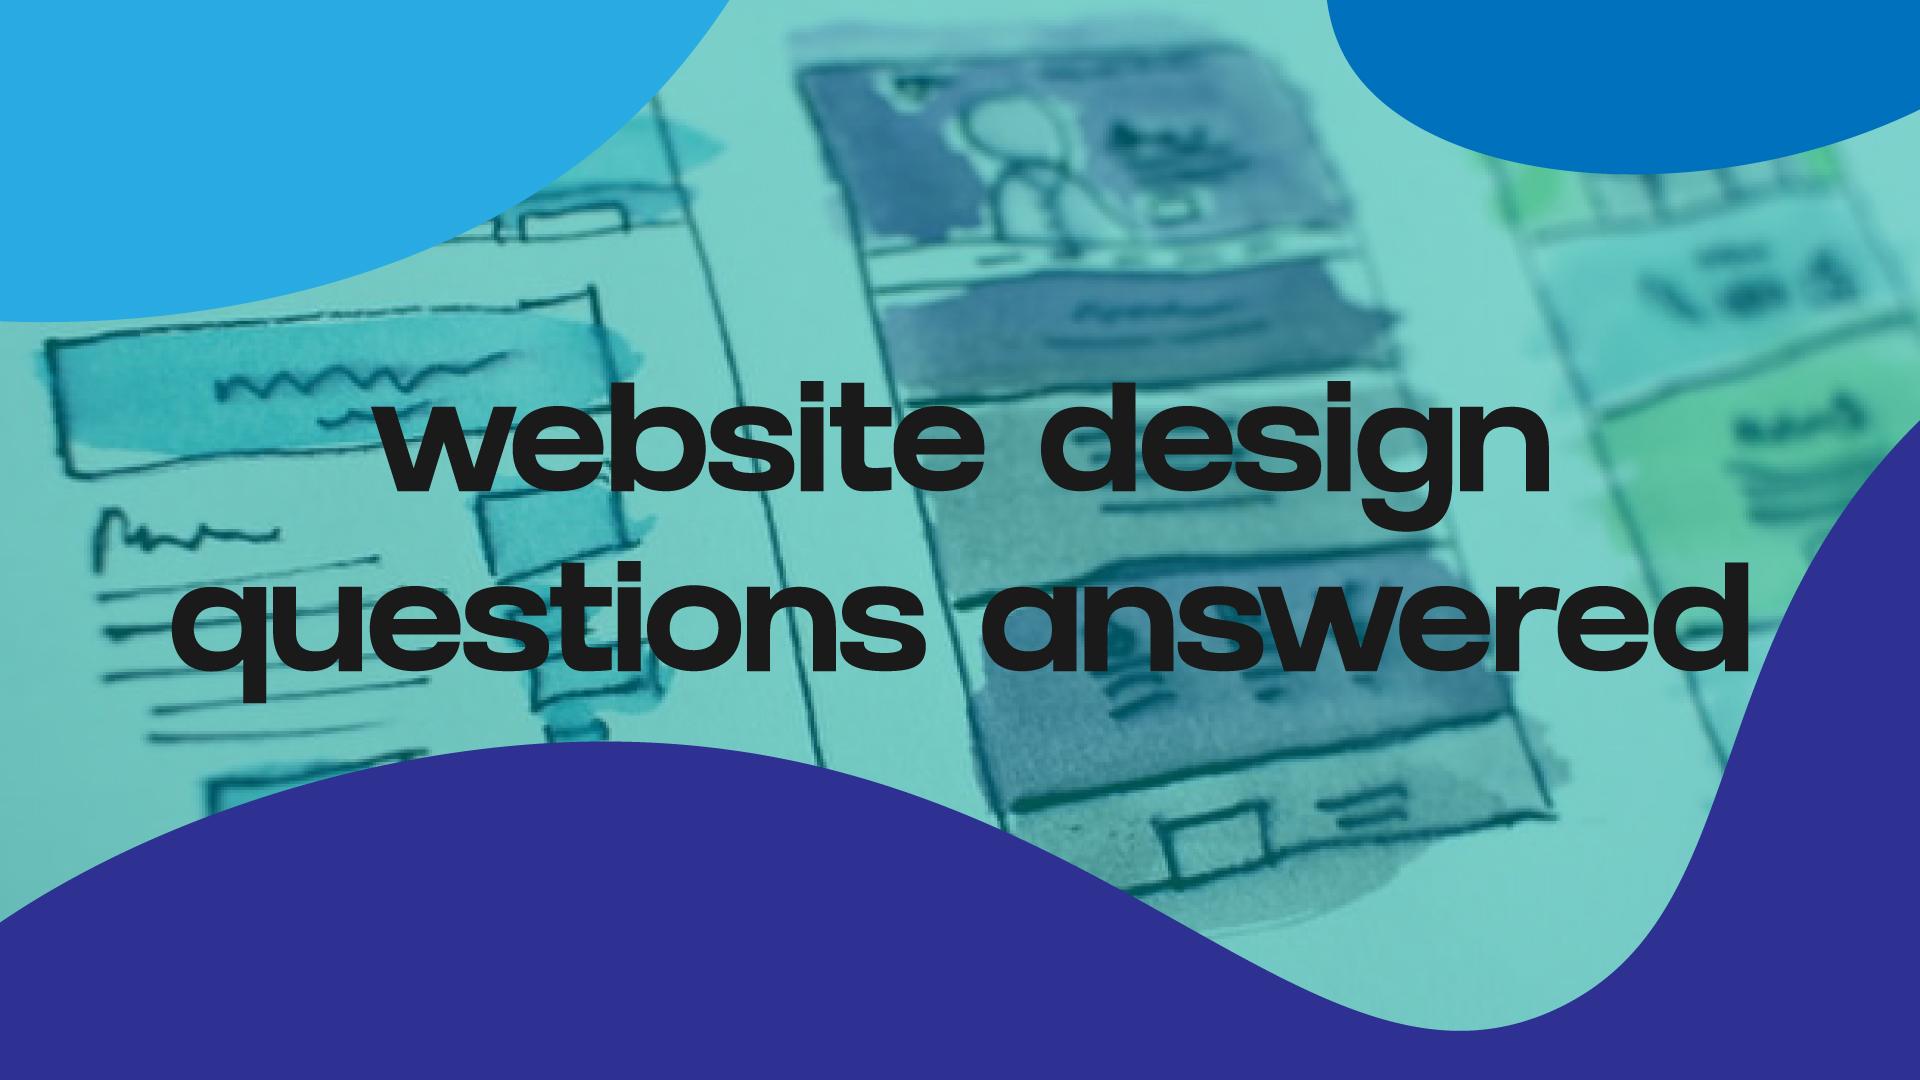 website design questions answered by Kamal Kulmedia Digital Studio